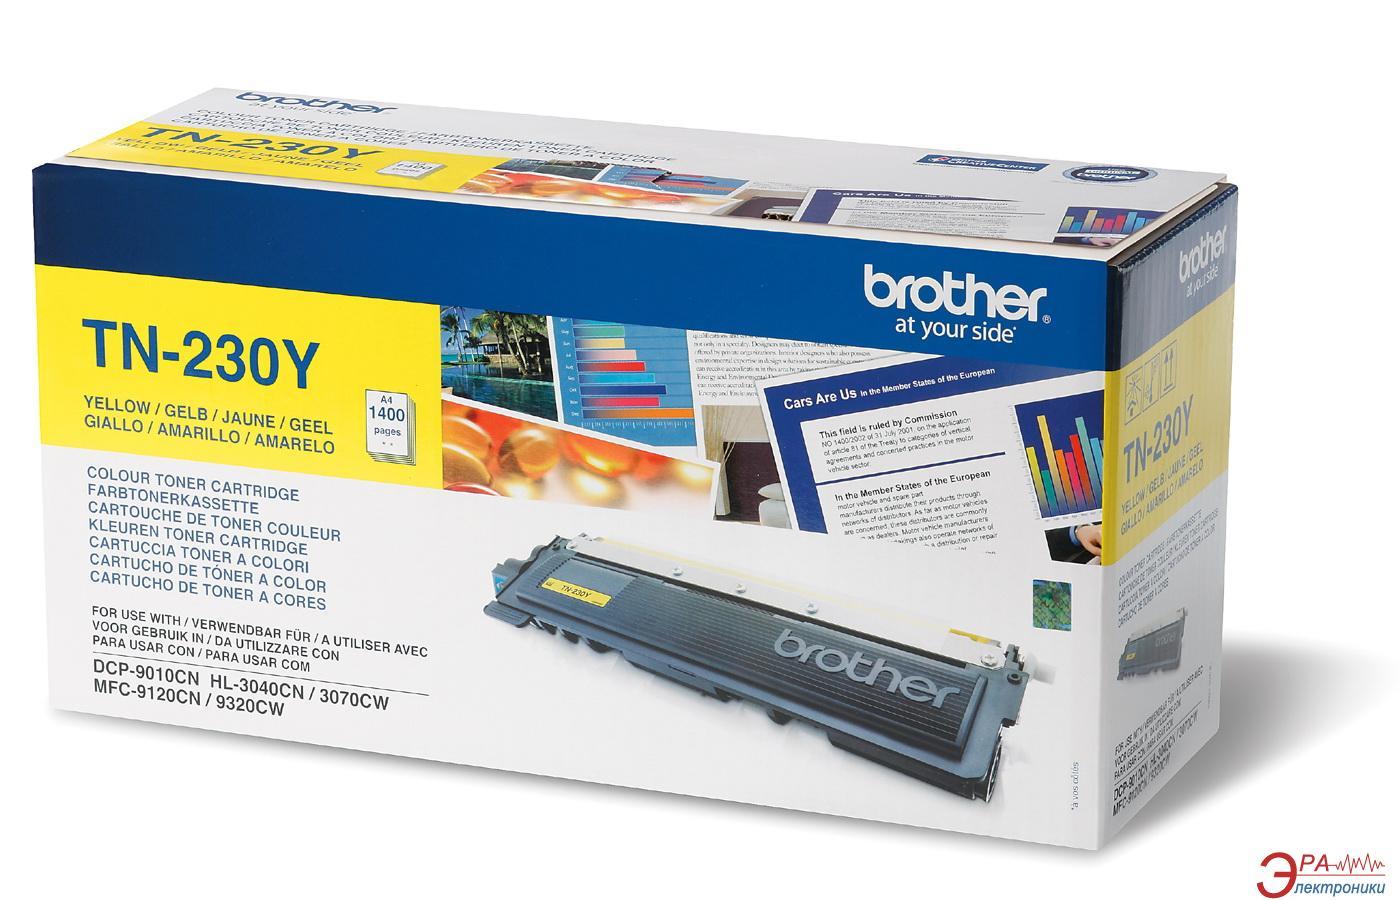 Картридж Brother (TN230Y) (HL-3040CN, DCP-9010CN, MFC-9120CN) Yellow